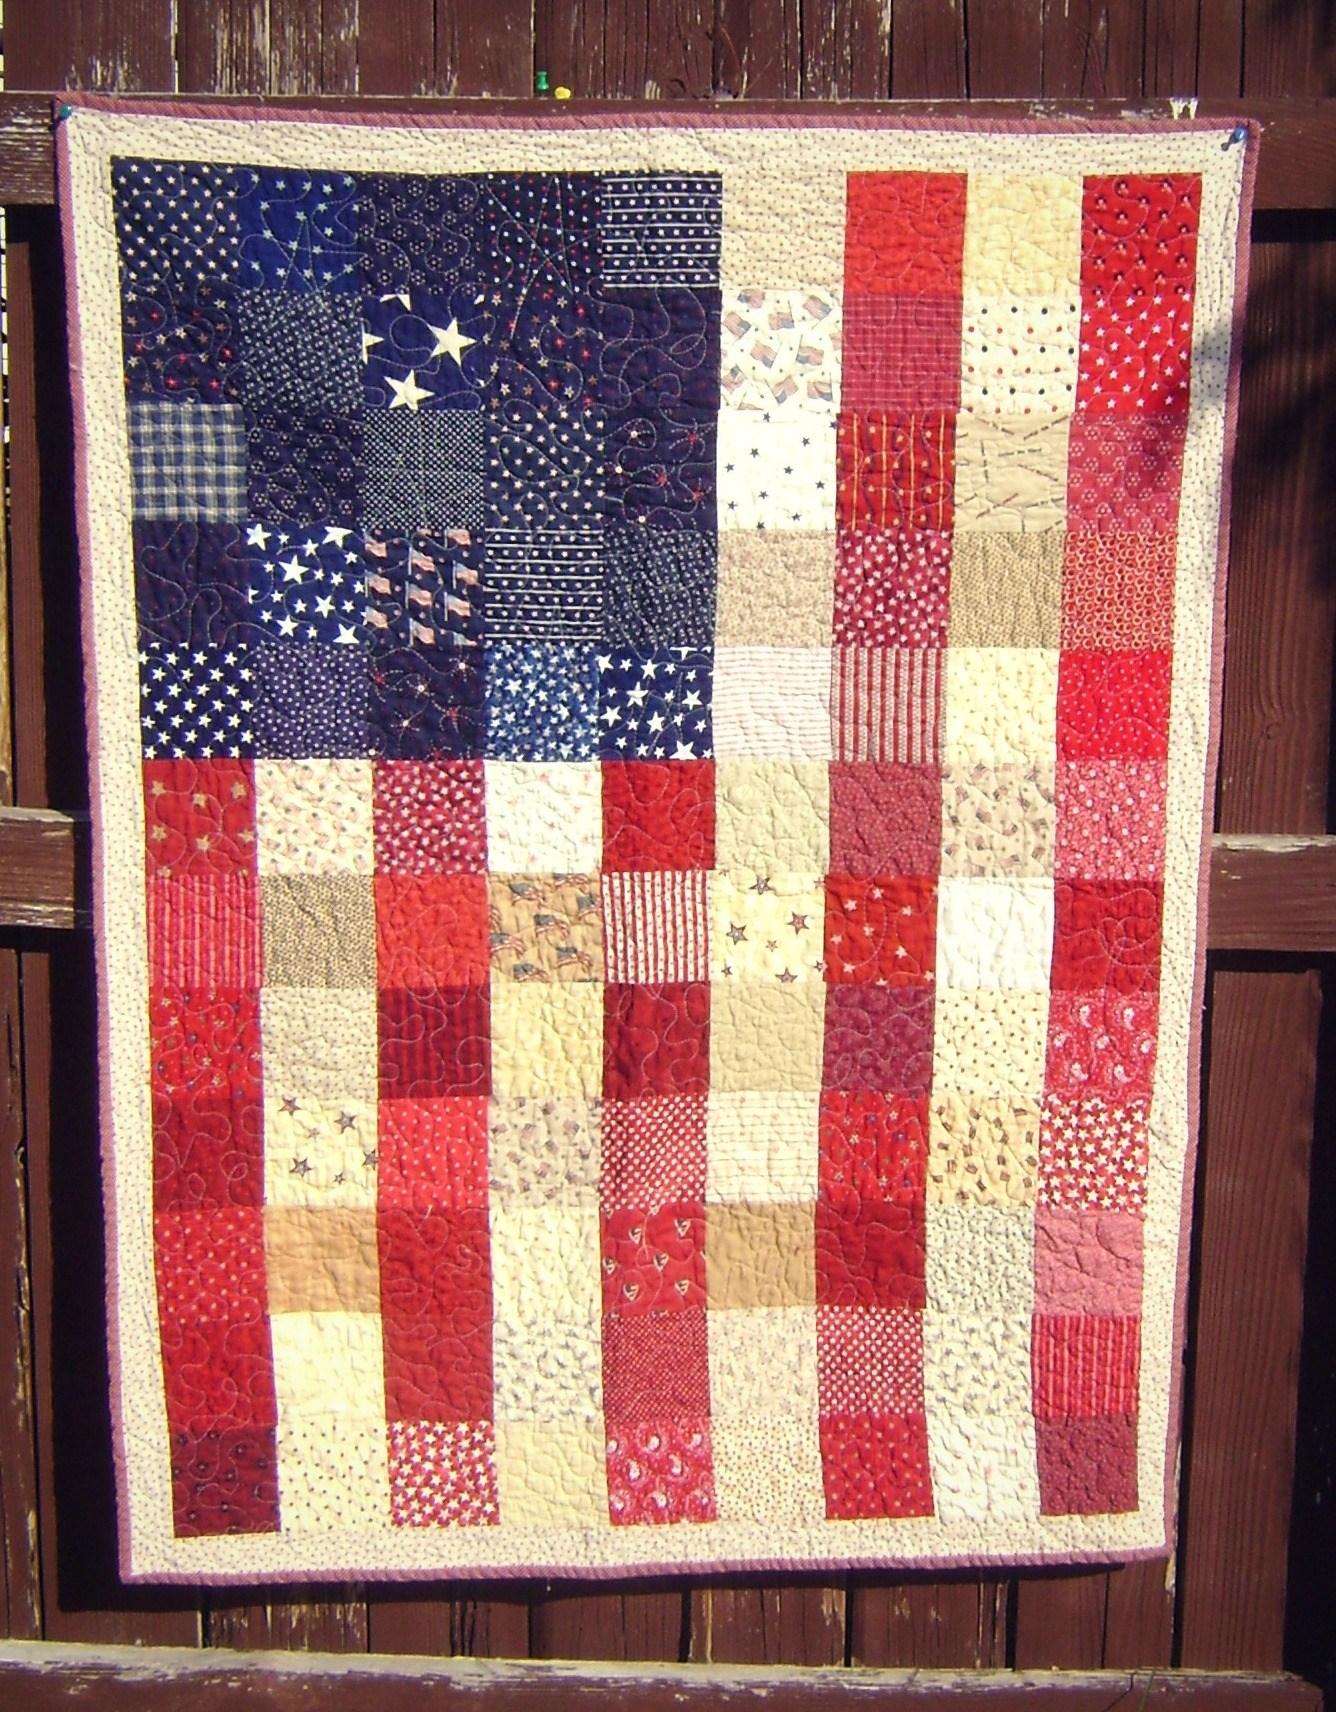 http://www.u-createcrafts.com/wp-content/uploads/2018/08/American-Flag-Pixel-Quilt.jpg